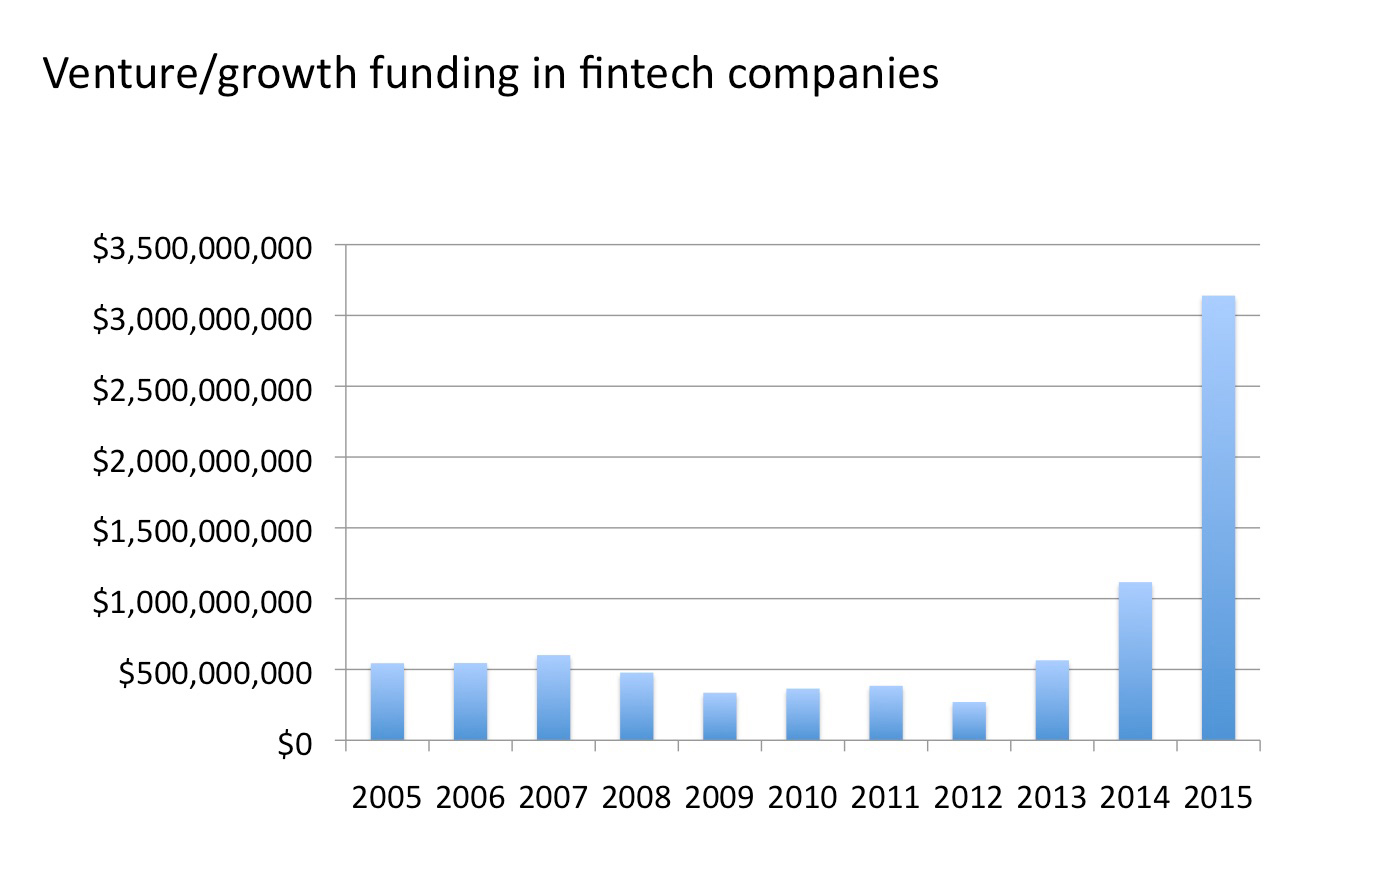 Venture growth